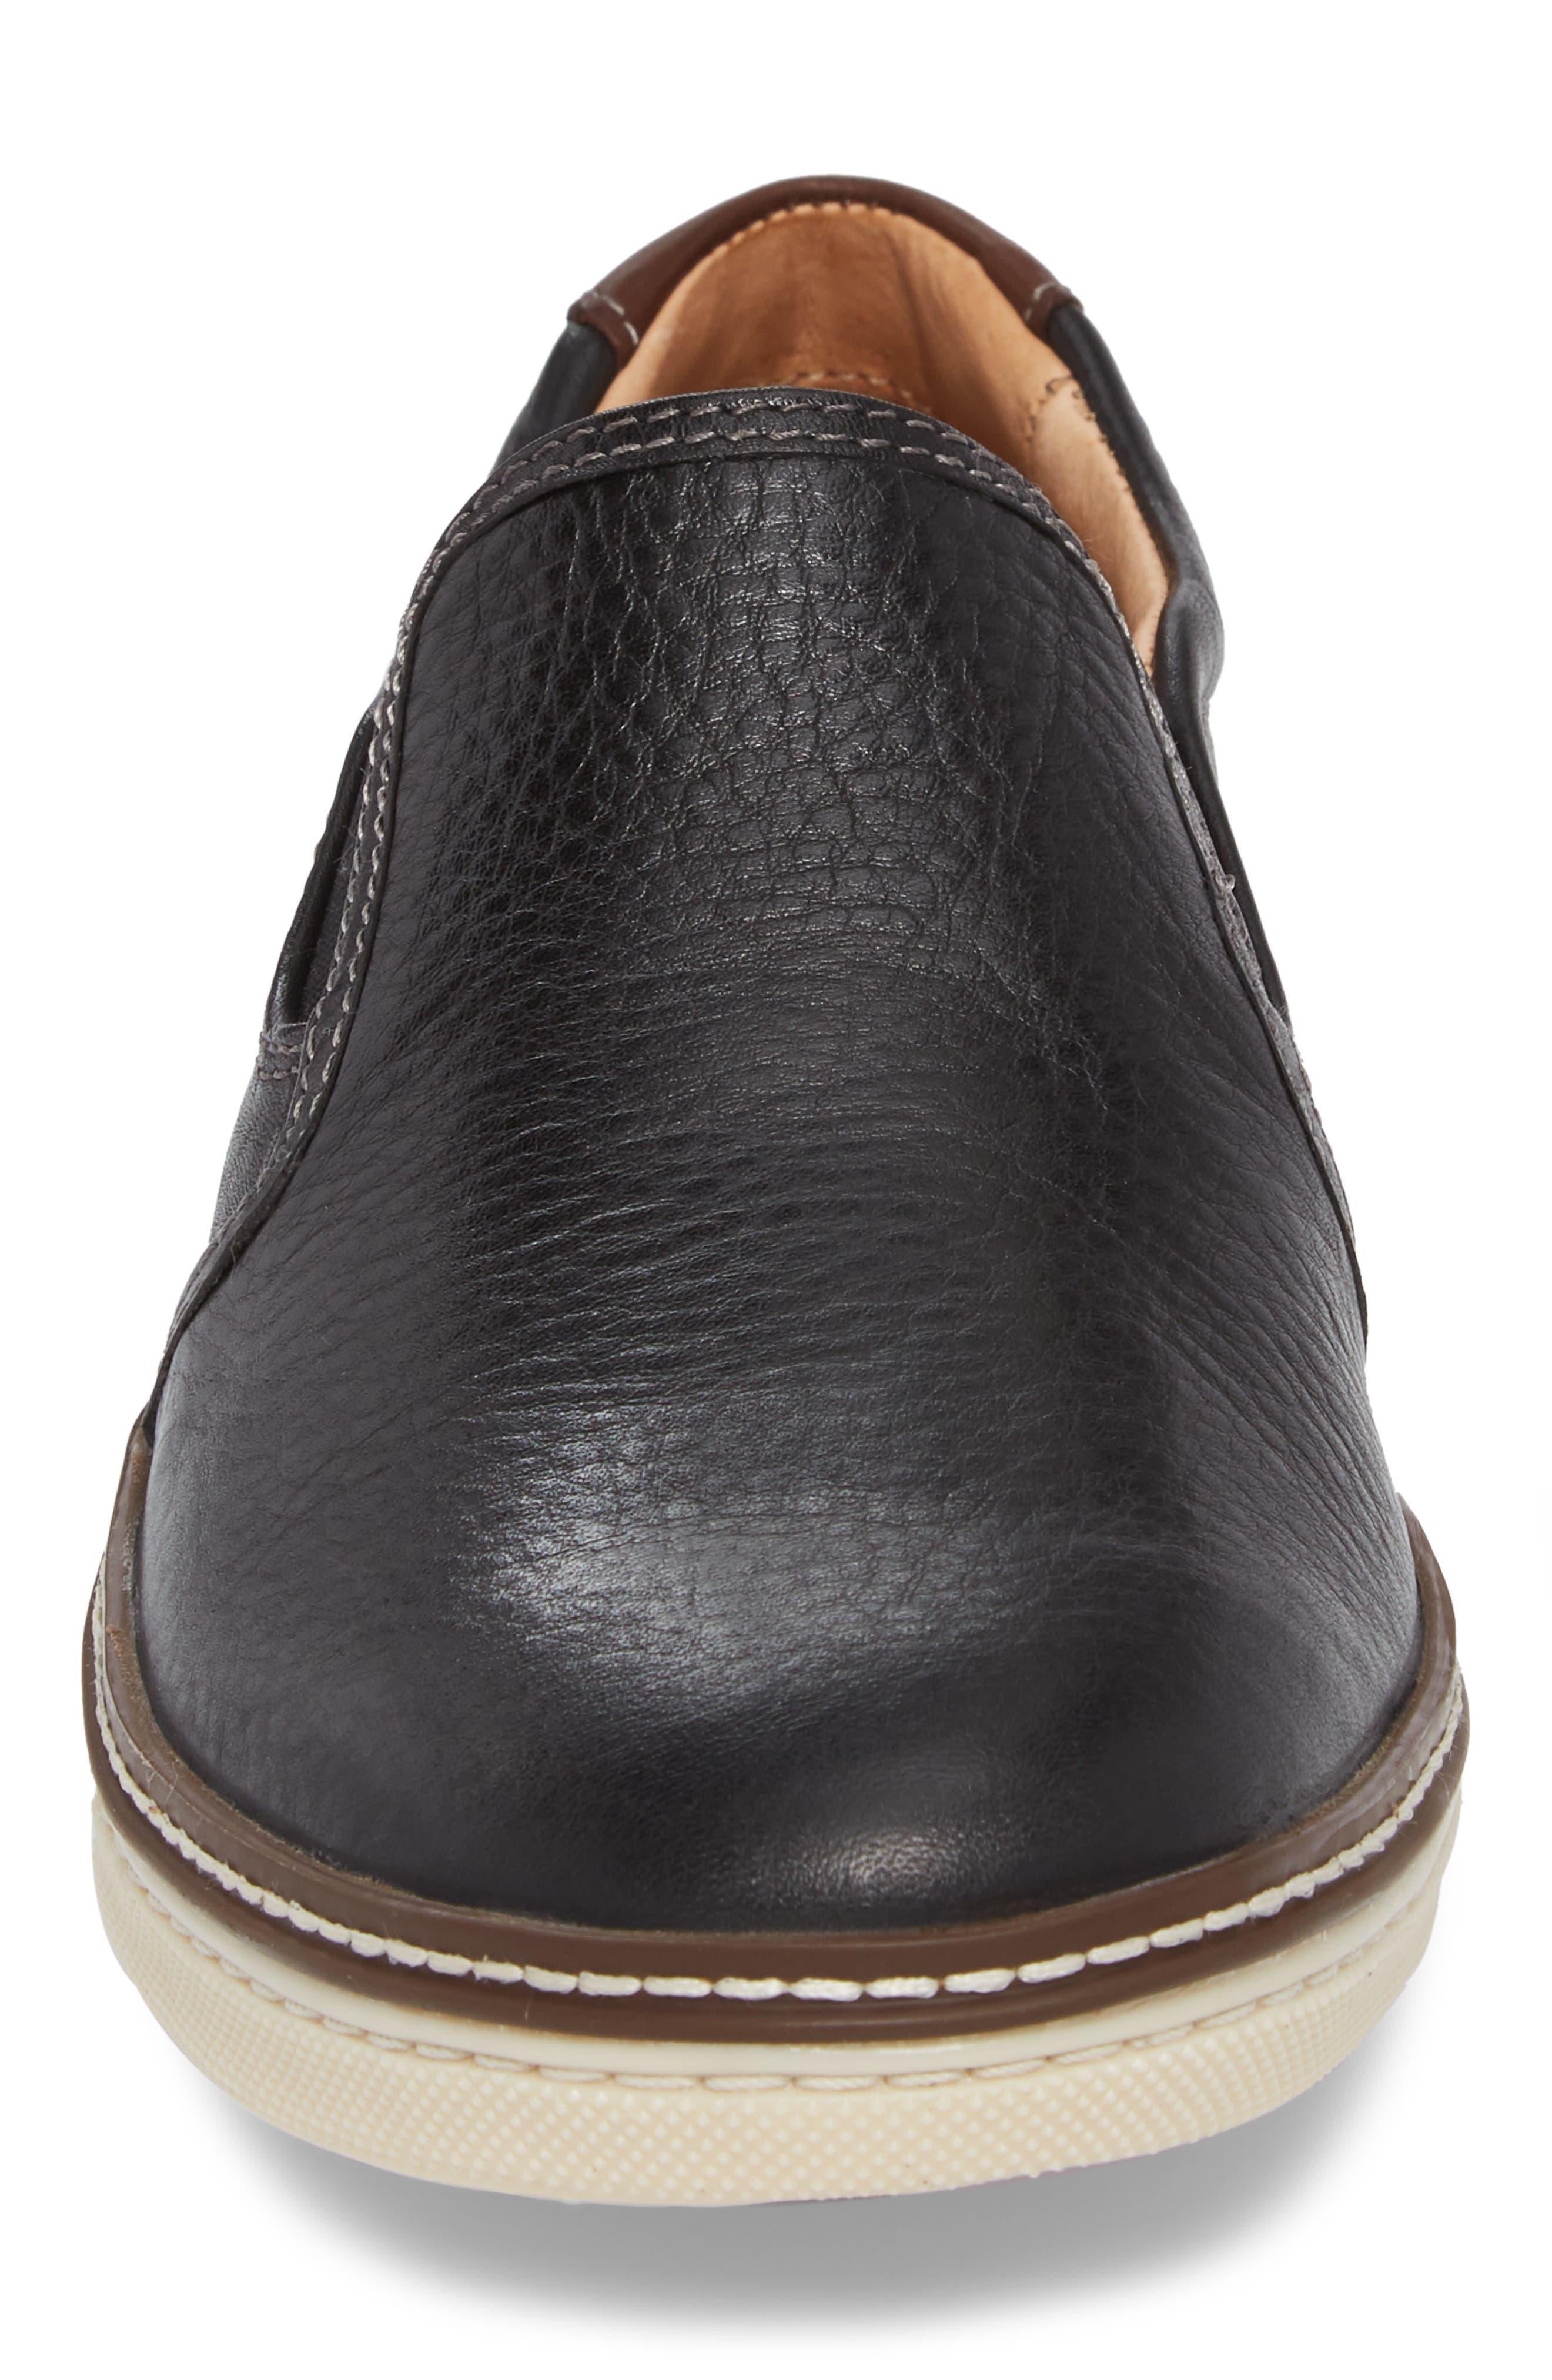 McGuffey Slip-On Sneaker,                             Alternate thumbnail 4, color,                             Black Leather